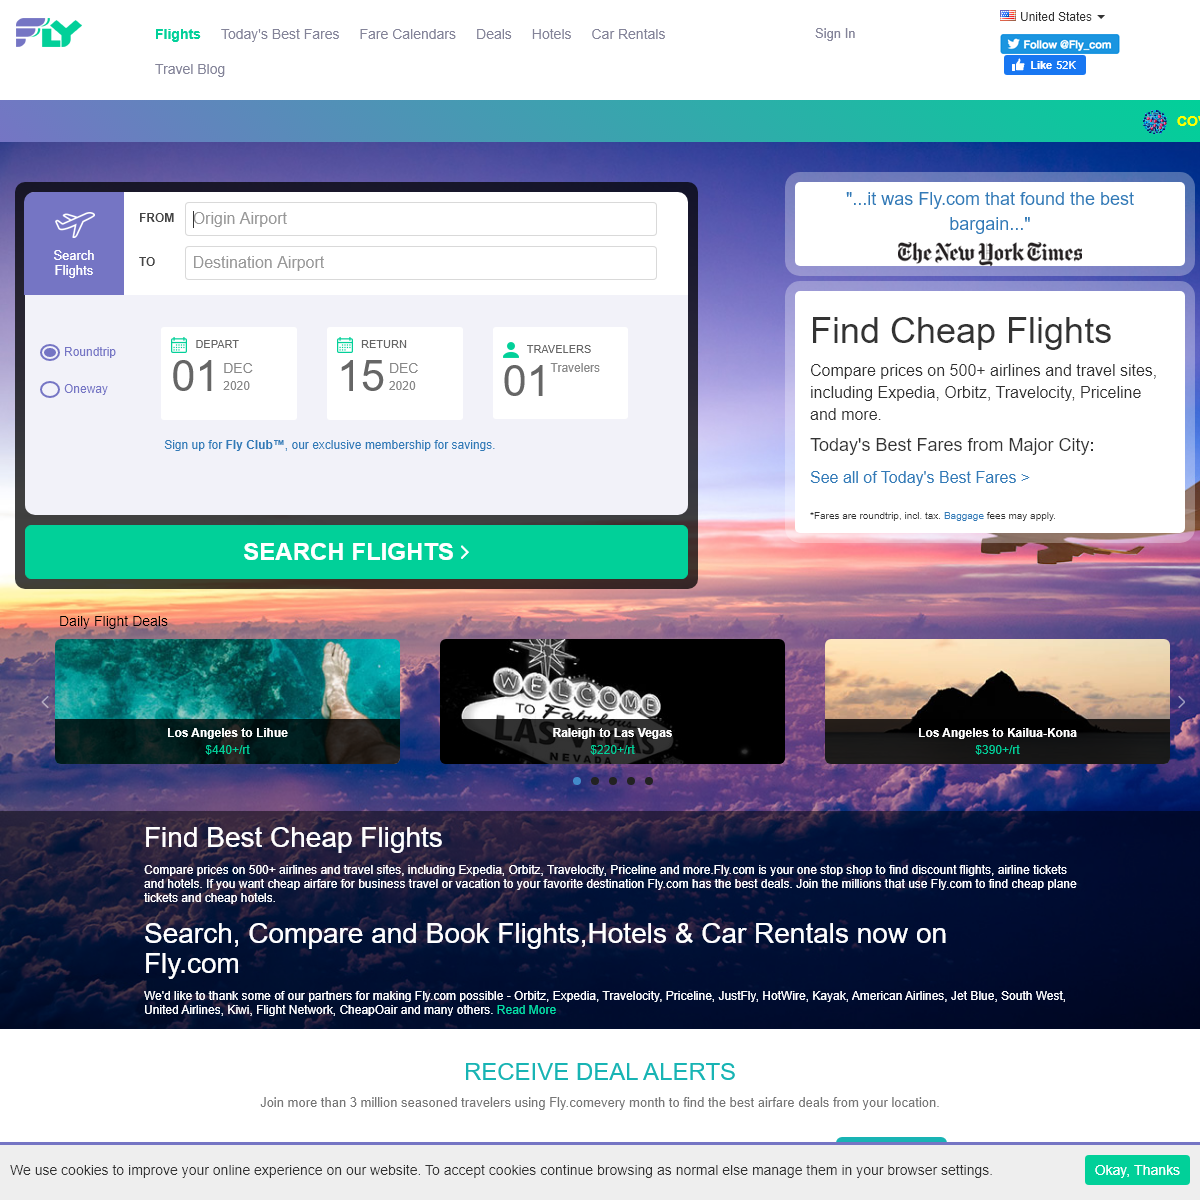 Cheap Flights- Flights Tickets, Airline Tickets, Search Flights - Fly.com us